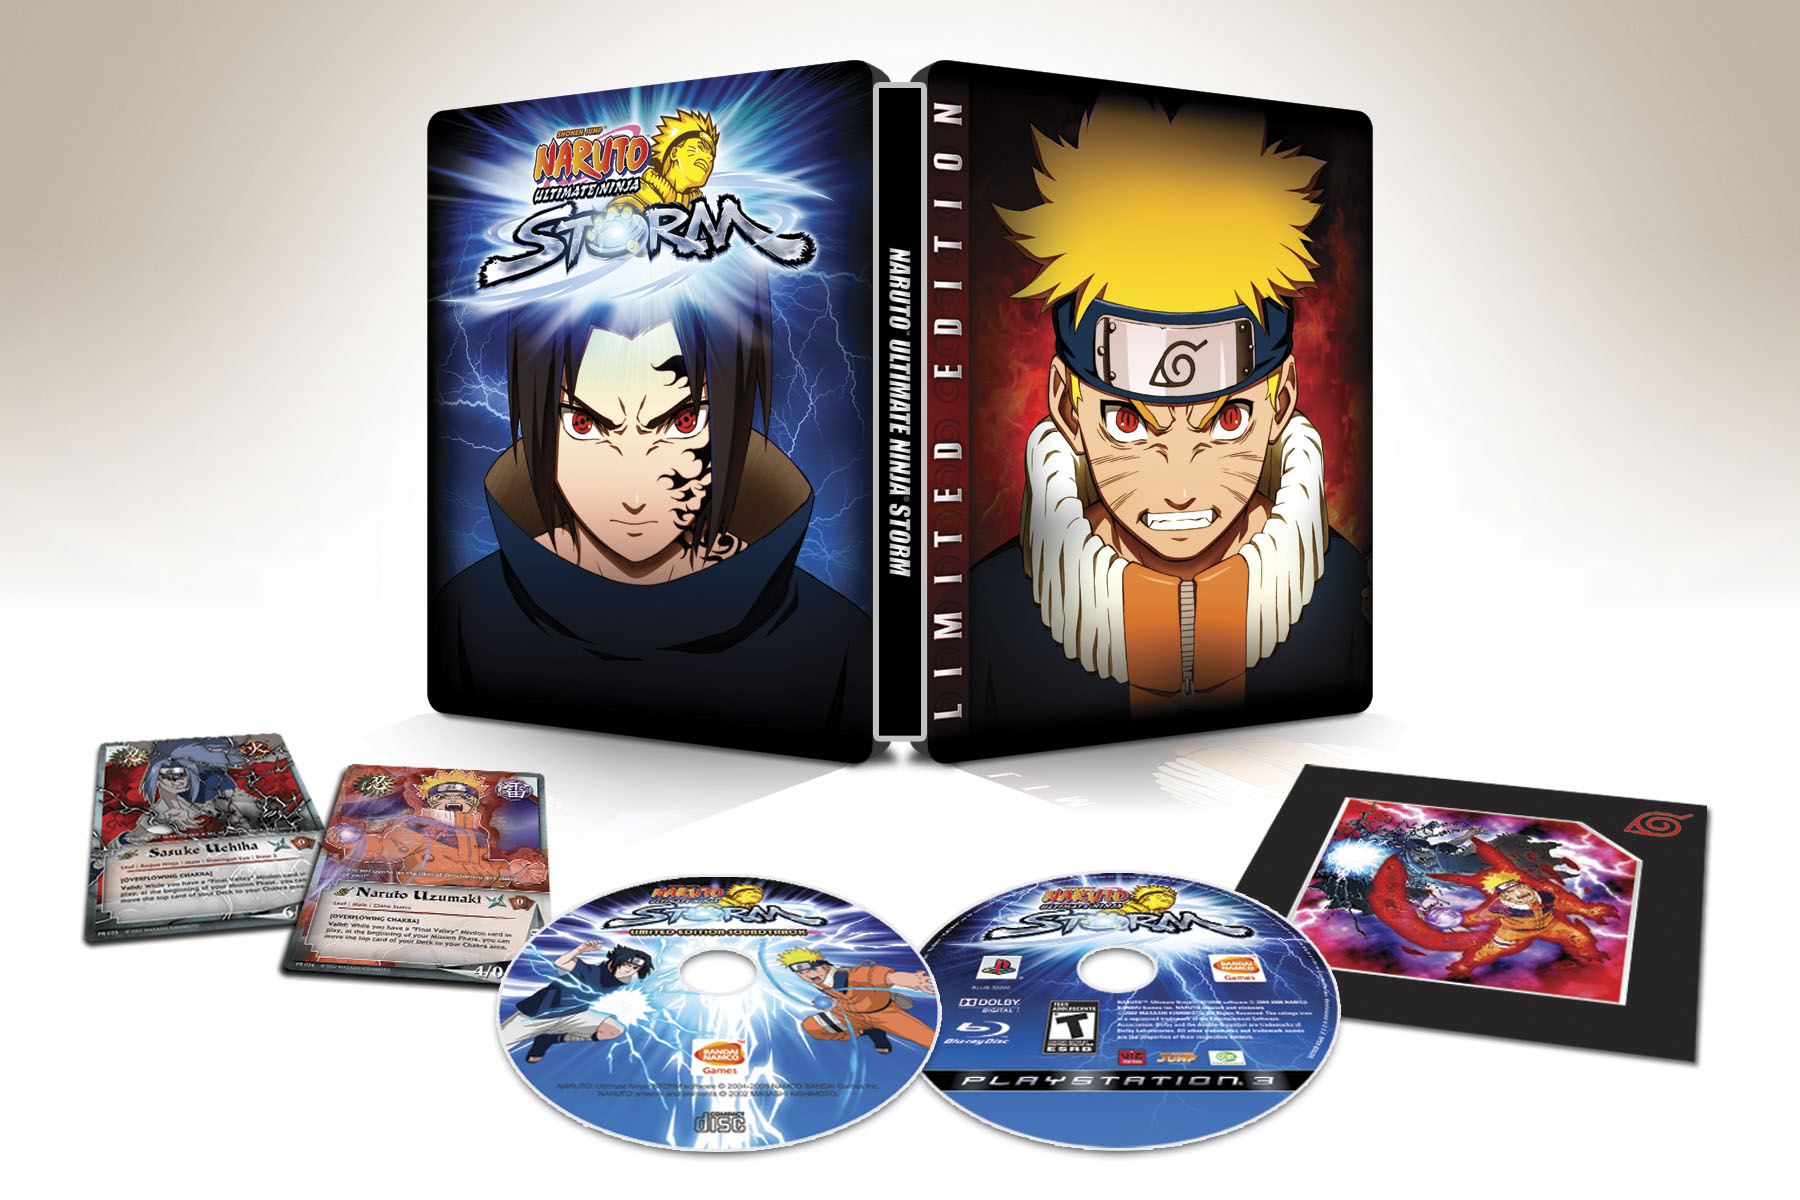 Naruto: Ultimate Ninja Storm Gets Limited Edition - Gematsu